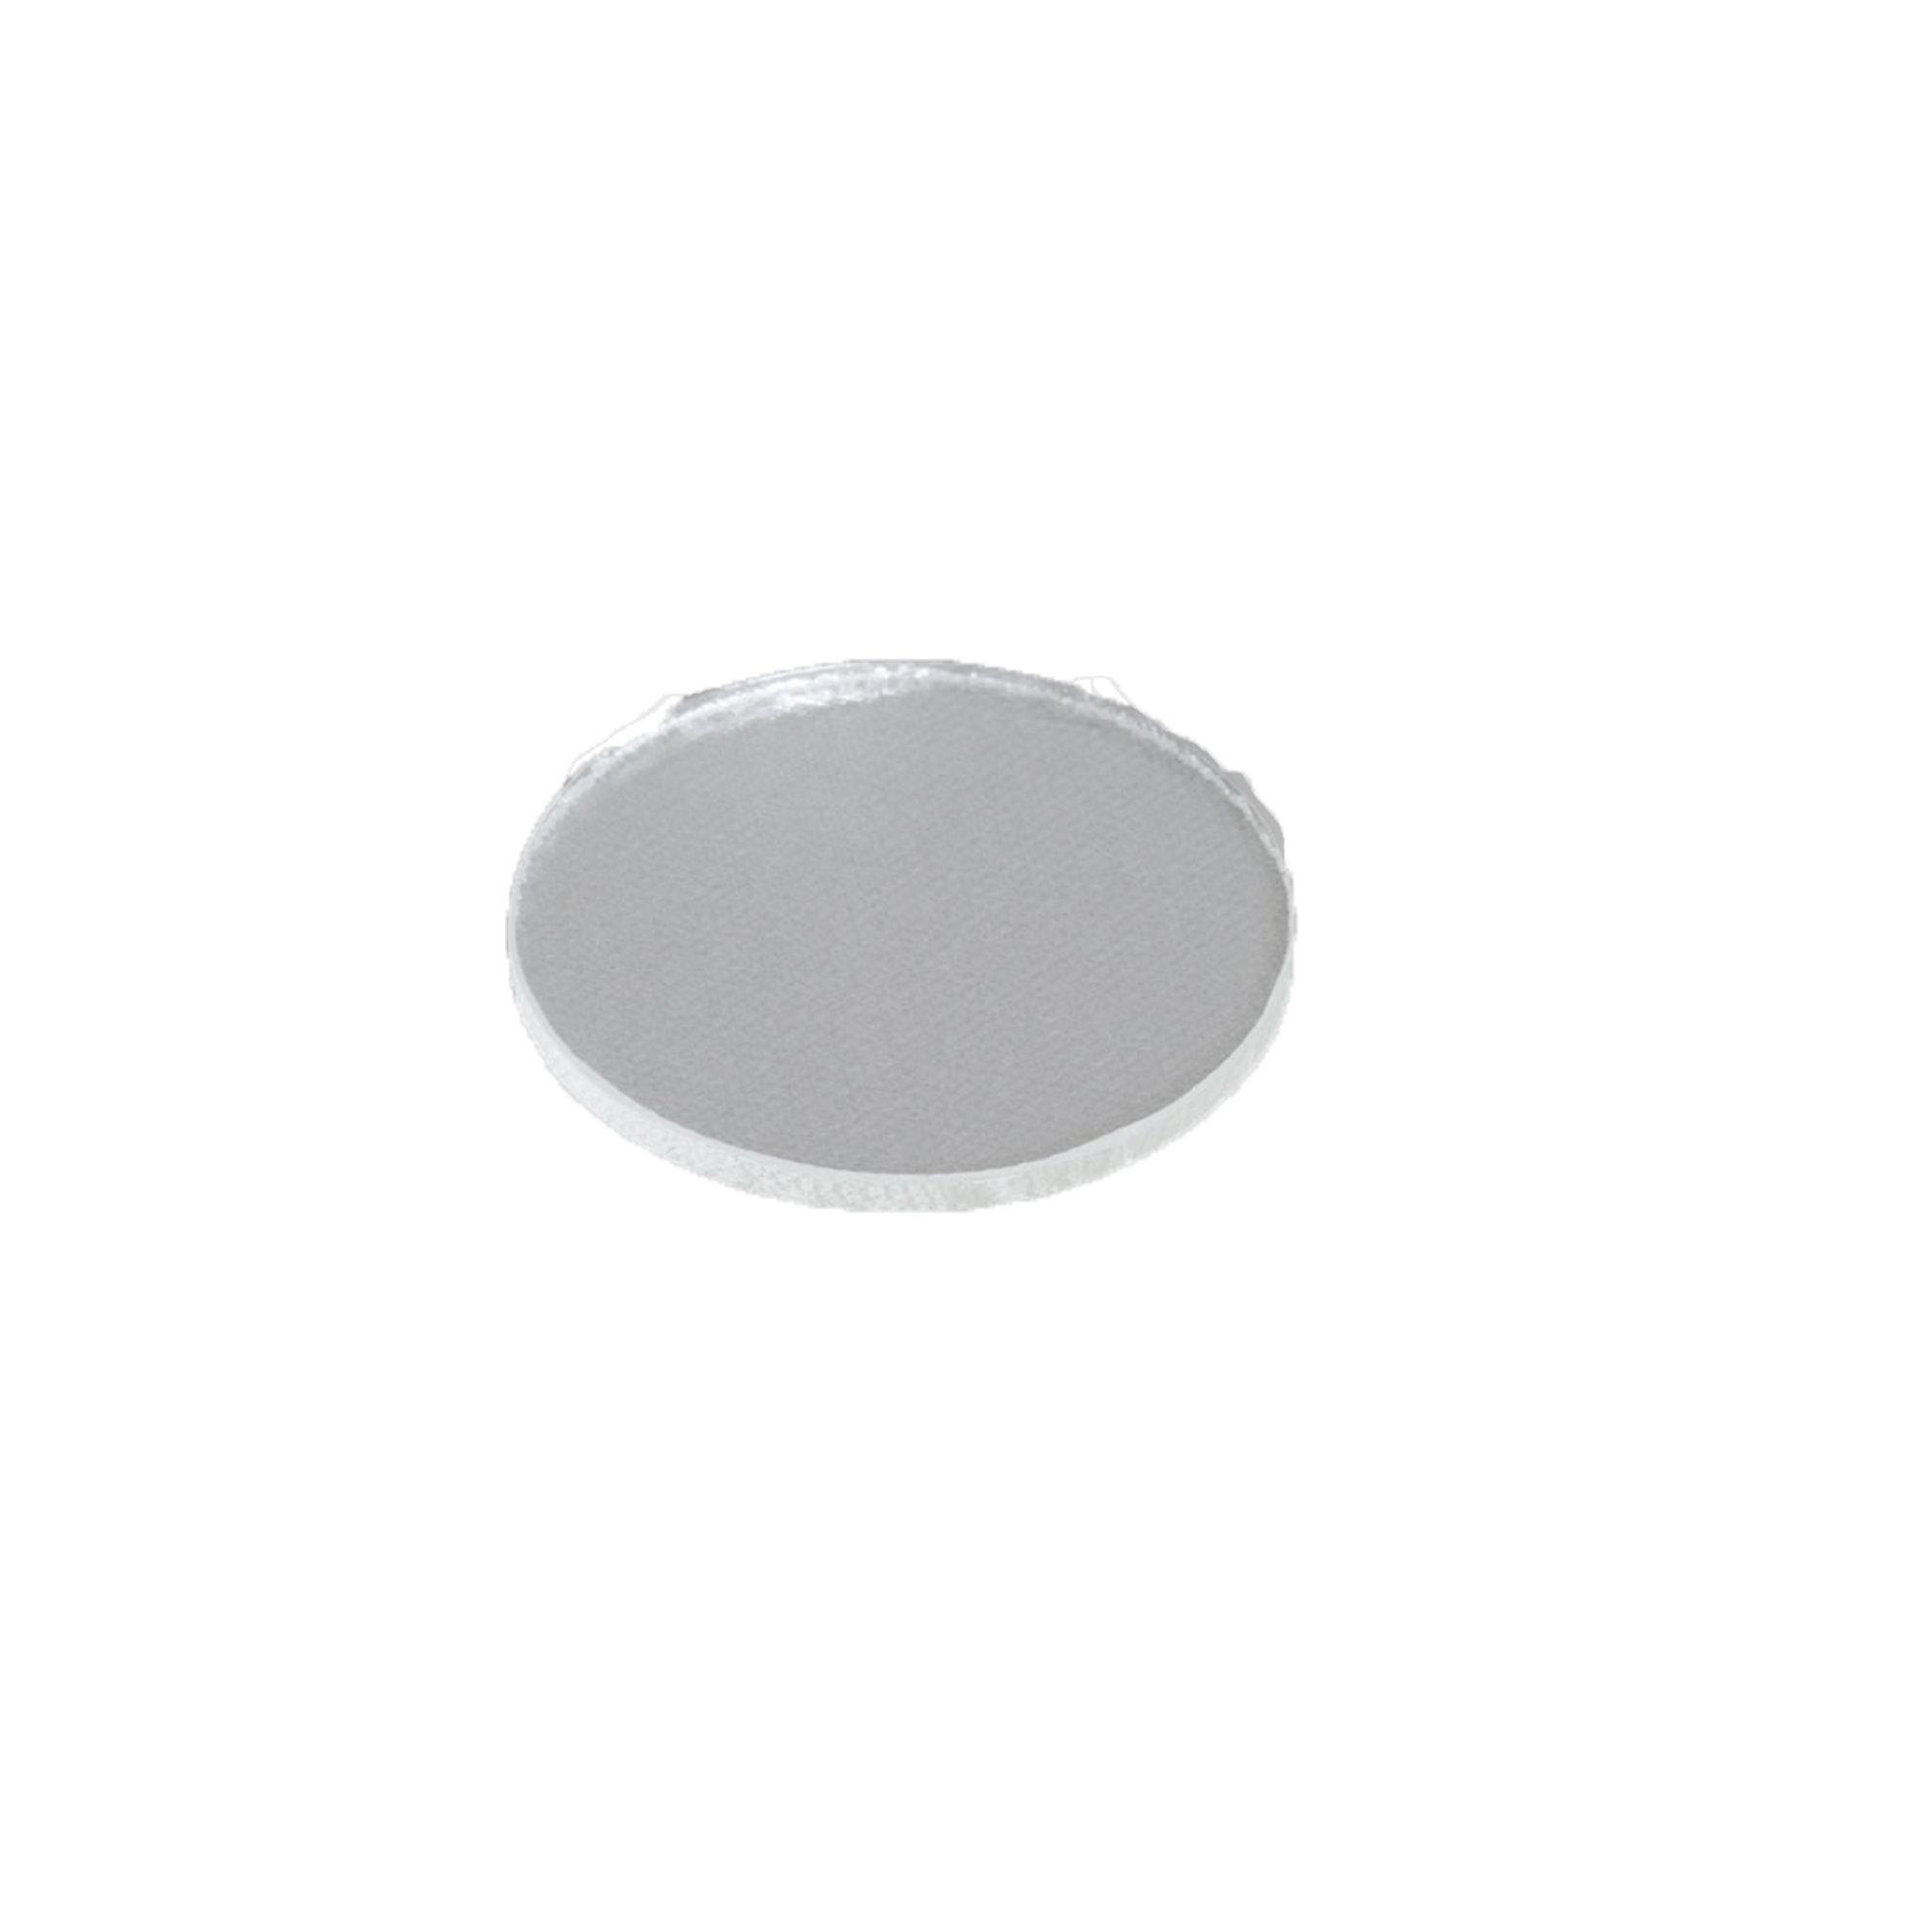 Vorsa 50 Linear Spreader Lens Ø51.5mm